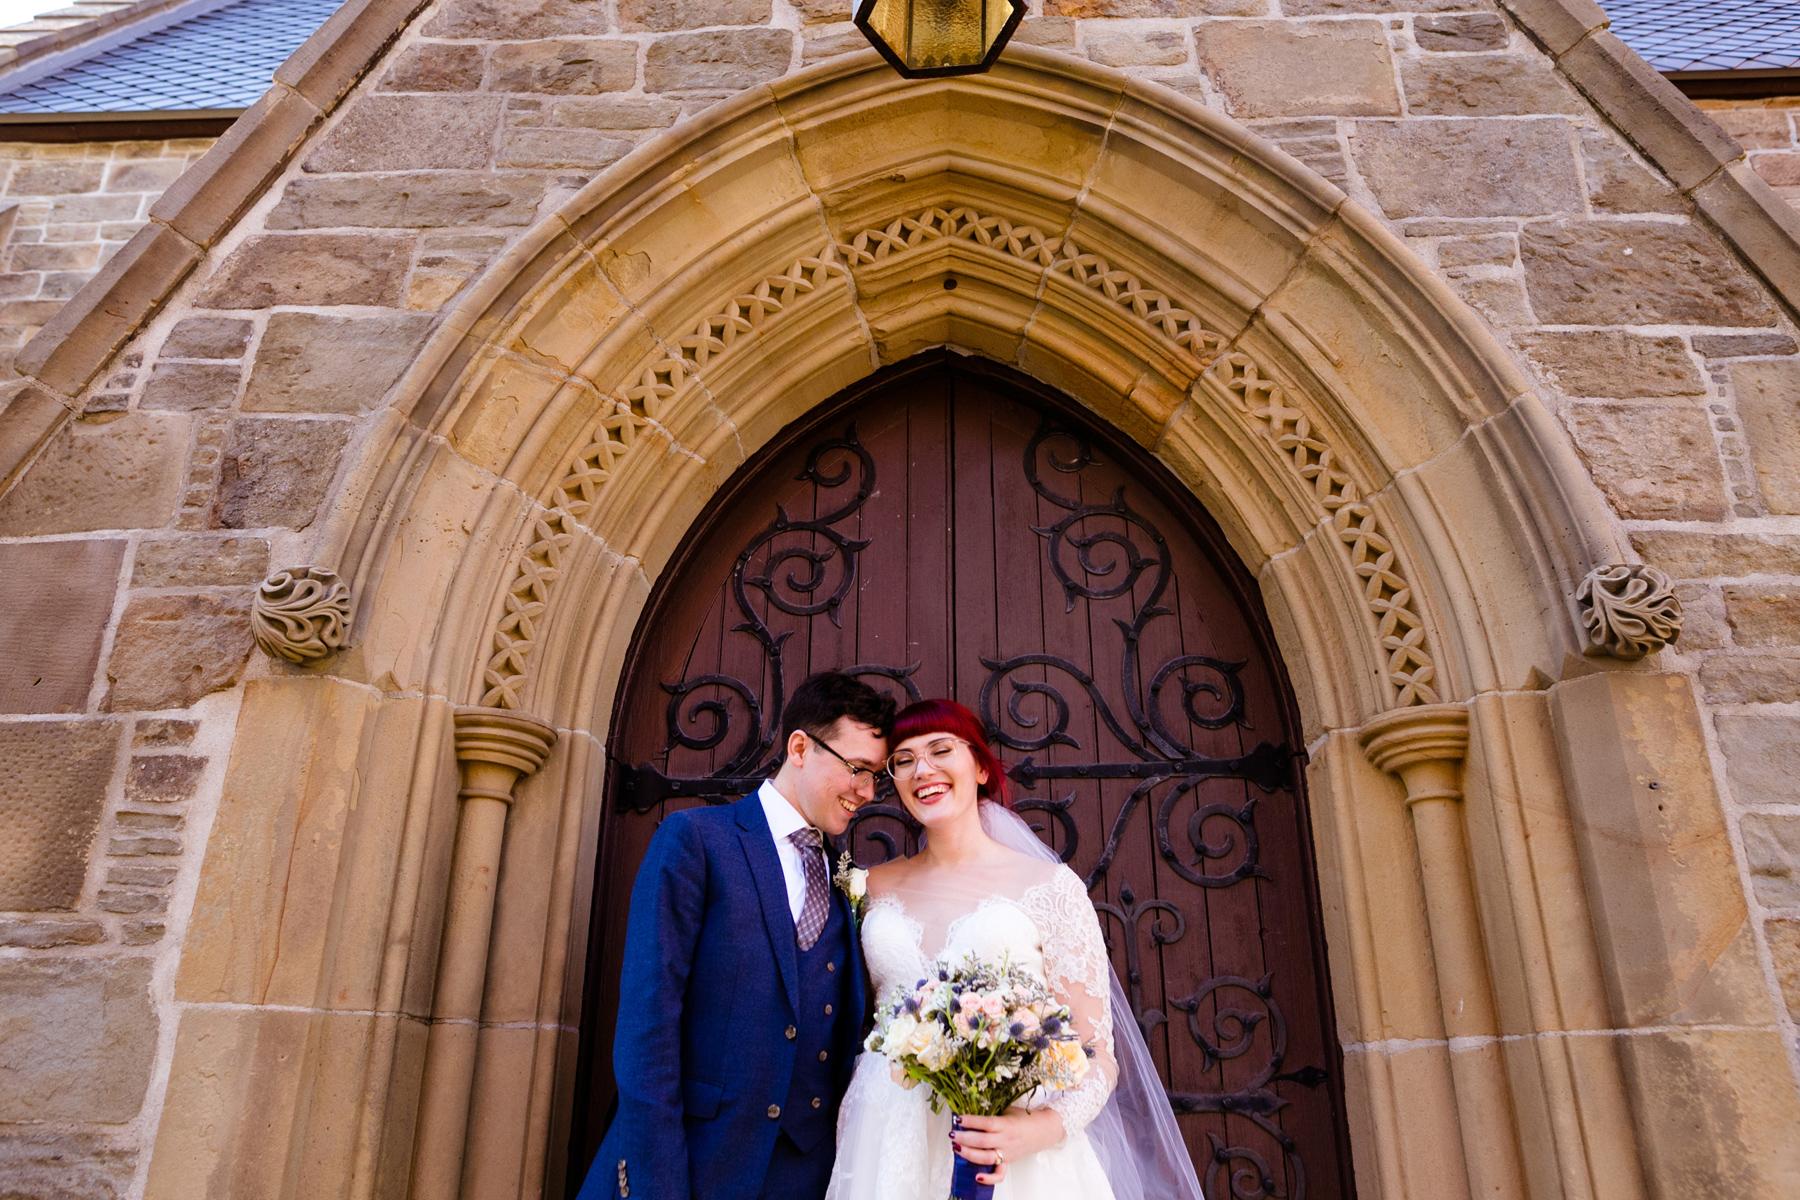 001-fredericton-wedding-photographer-kandisebrown-em2017